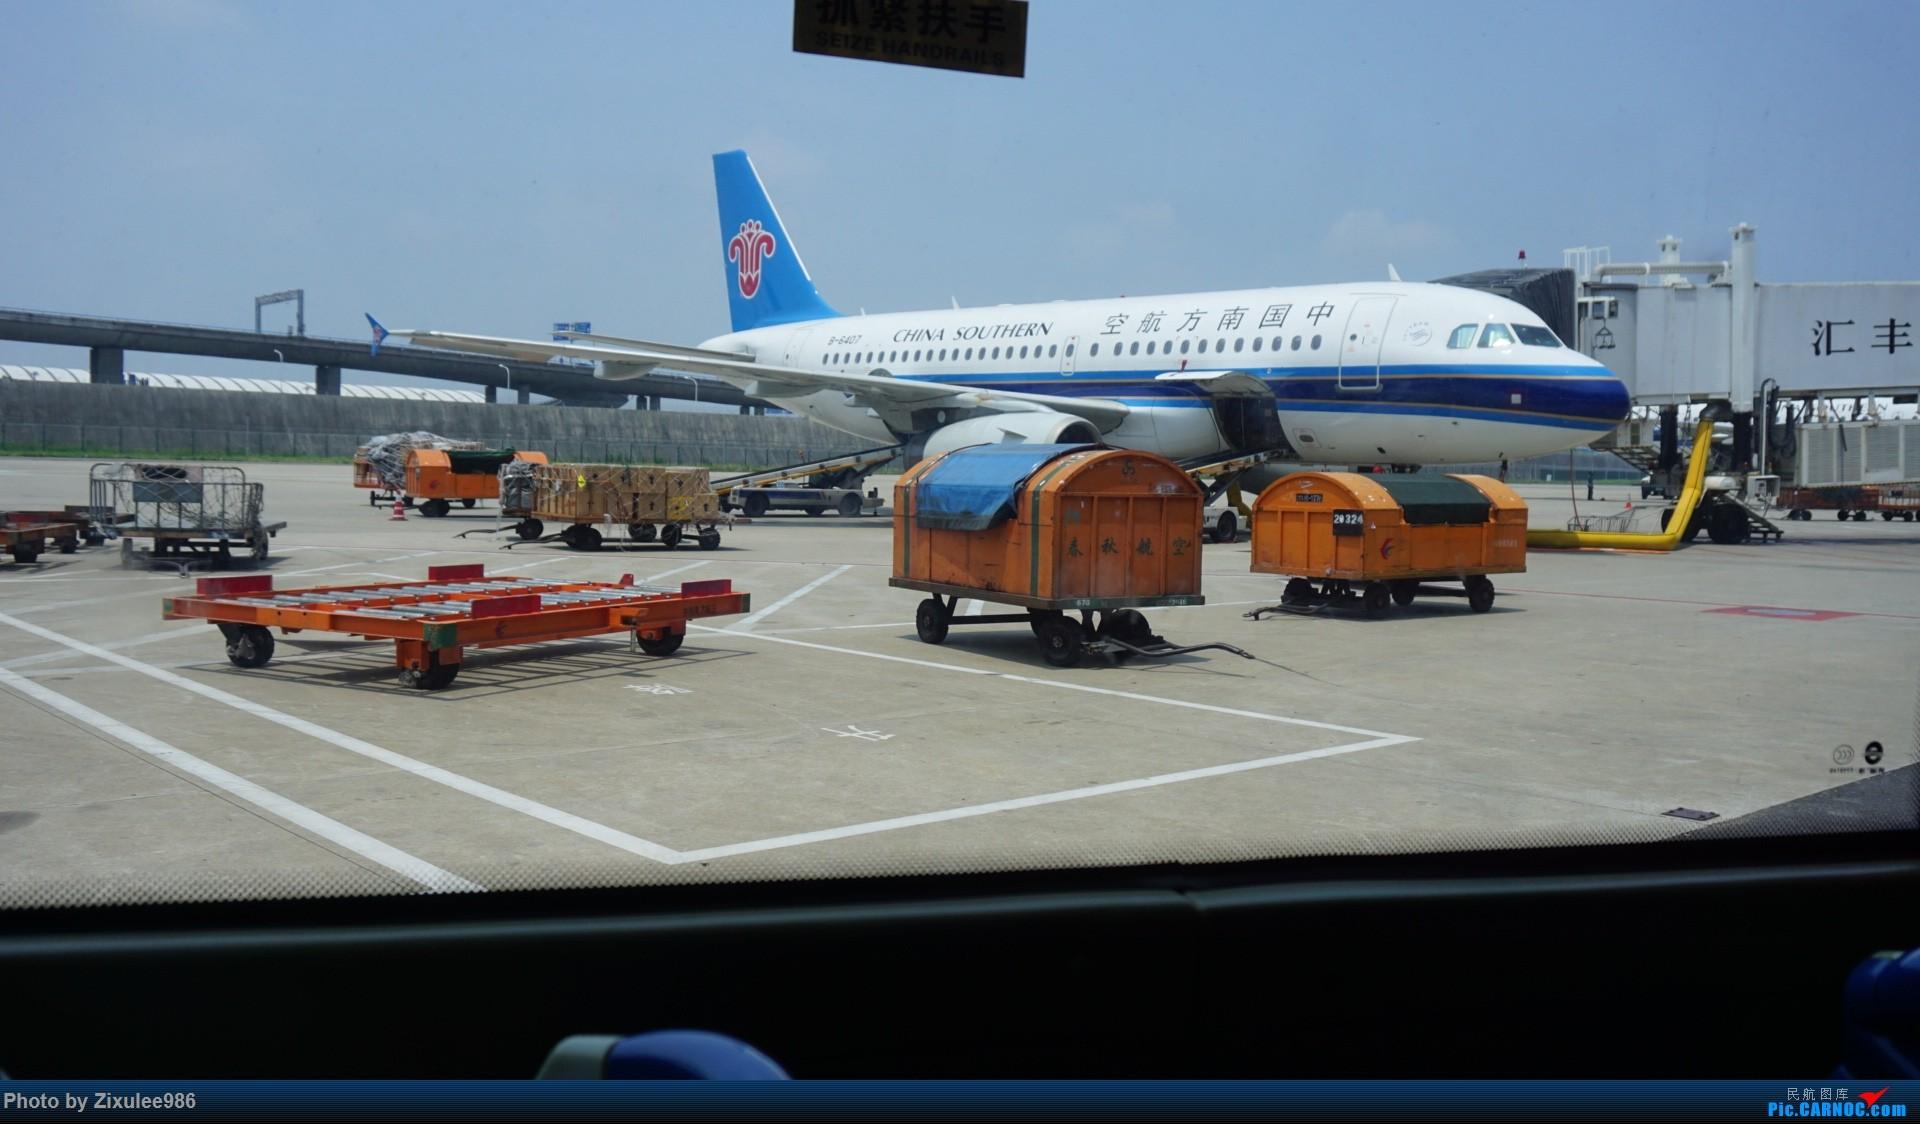 Re:[原创]加拿大21日游学之旅(一)~JJN-PVG-YYZ..(内含flightlog)~第一次发游记~多图缓更请谅解 AIRBUS A319-100 B-6407 中国上海浦东国际机场